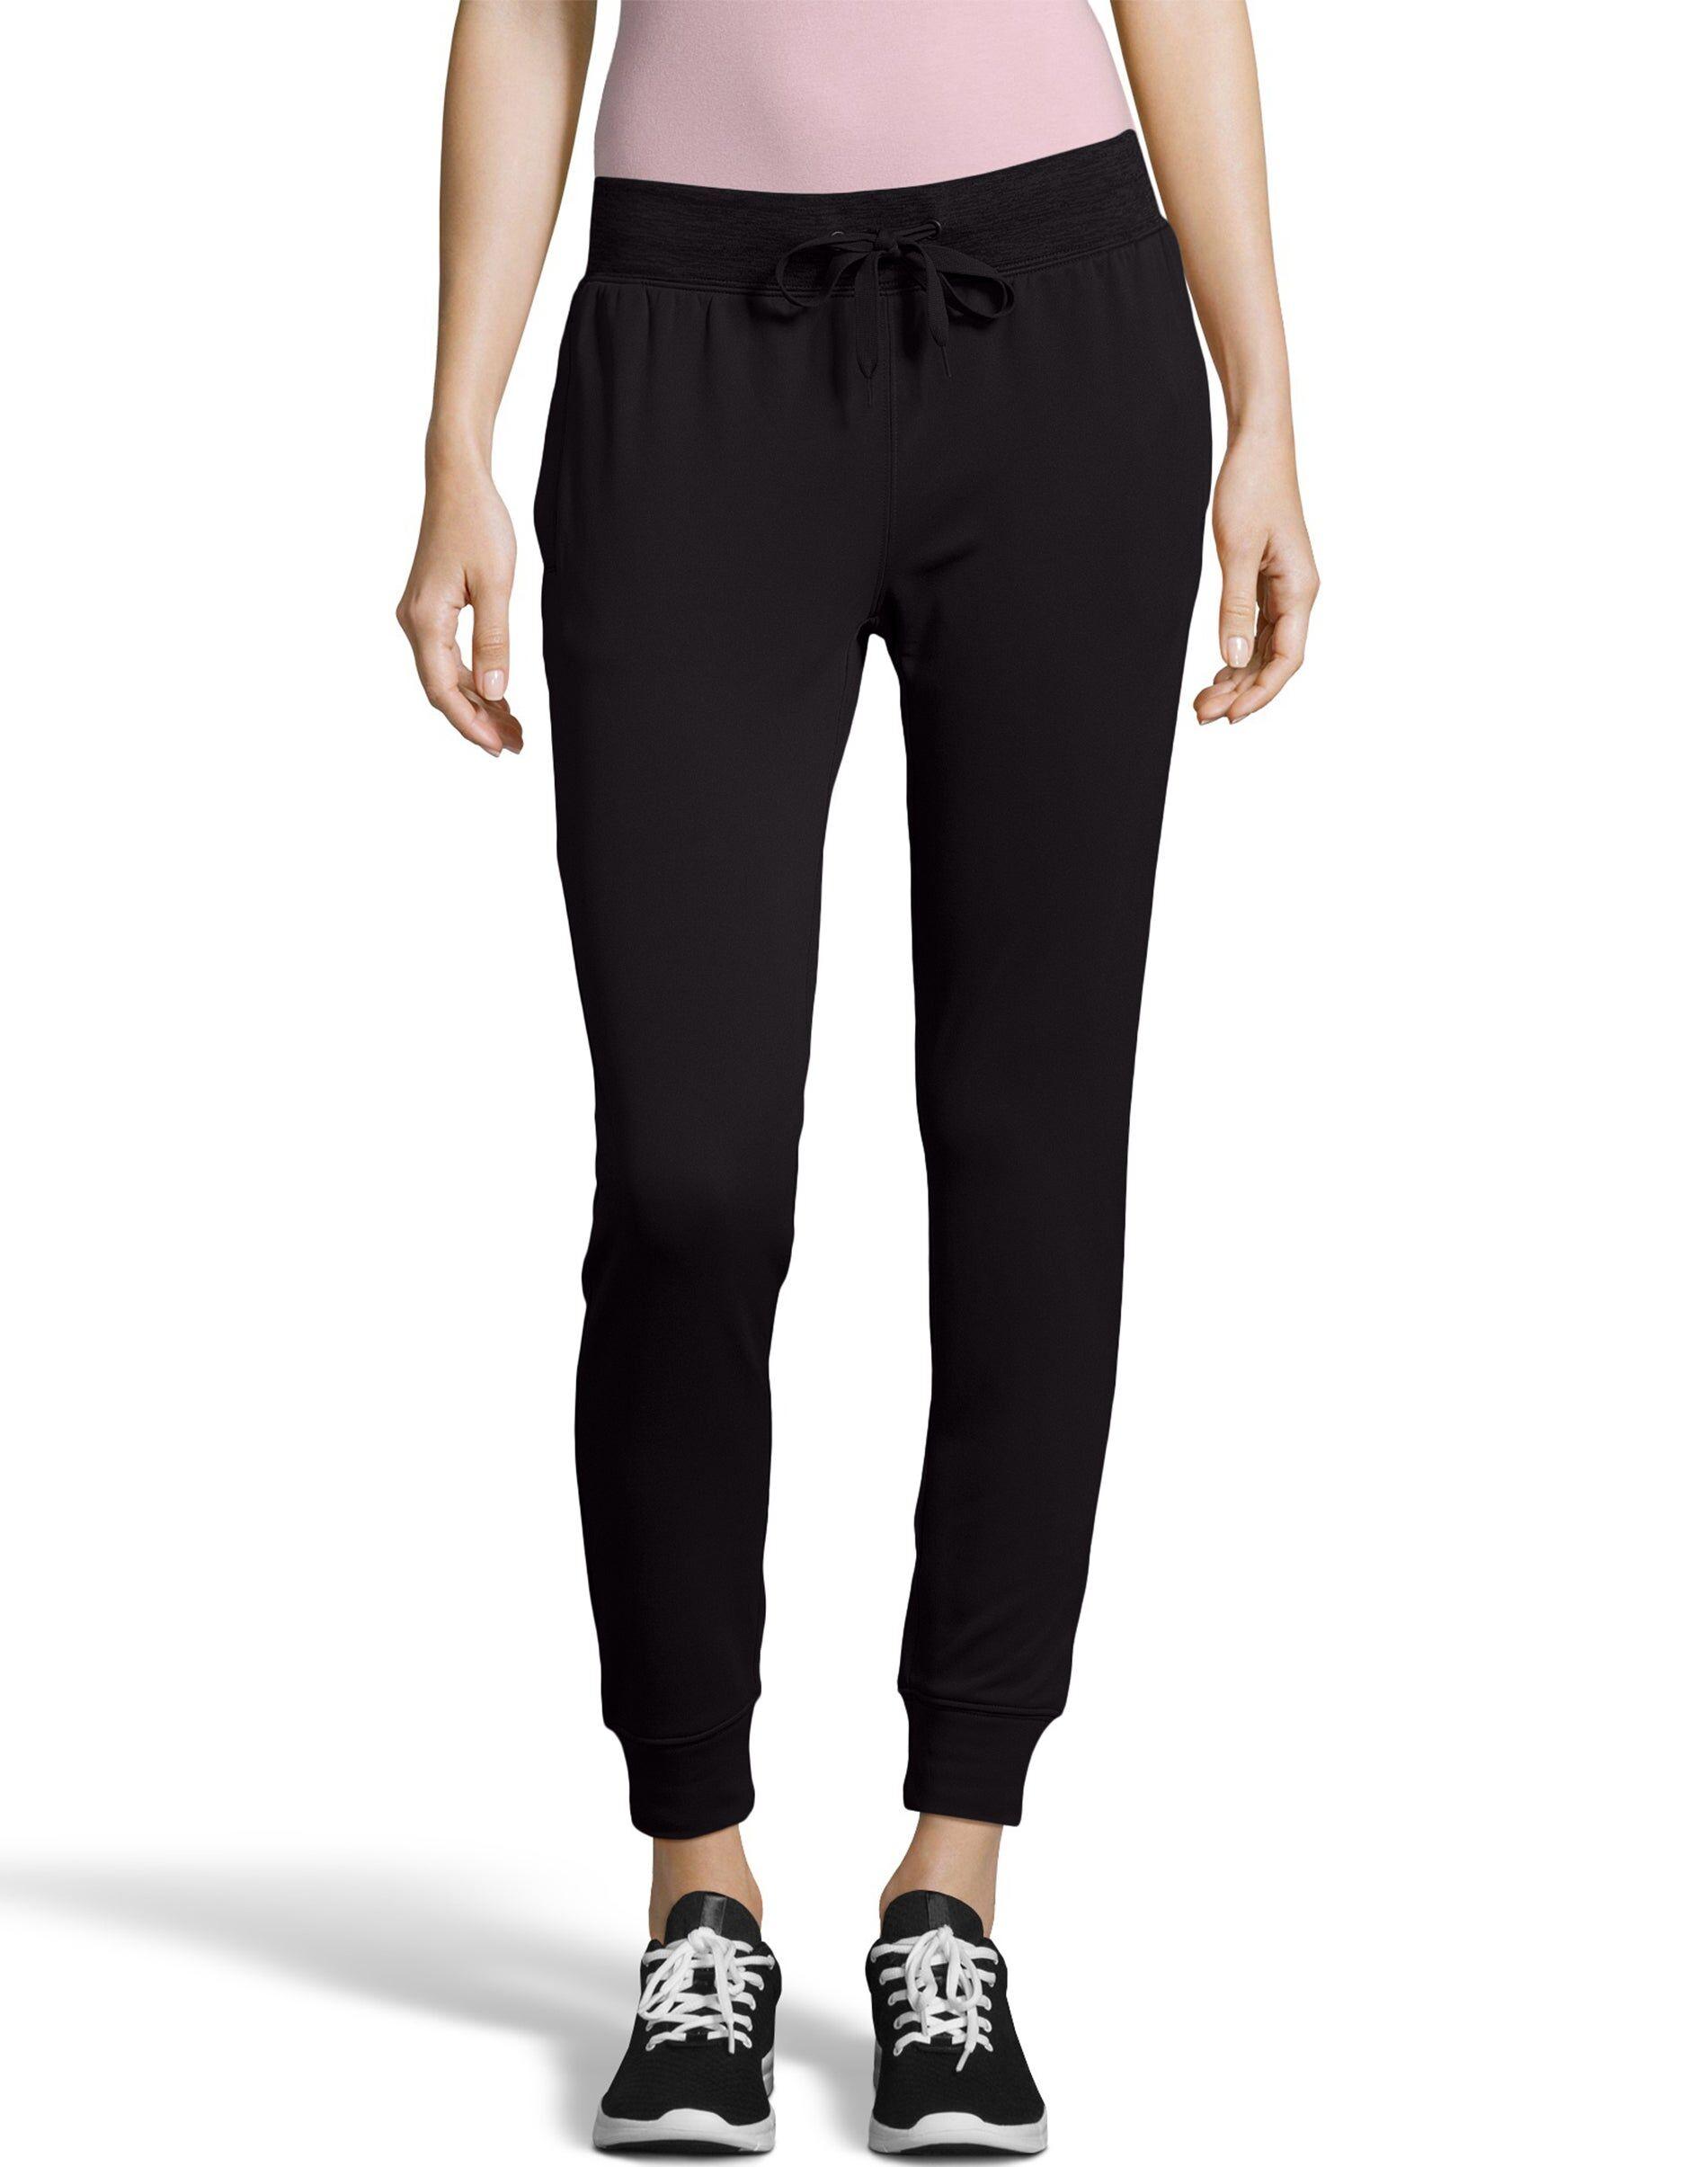 Hanes Sport Women's Performance Fleece Jogger Pants With Pockets Black/Black Heather L